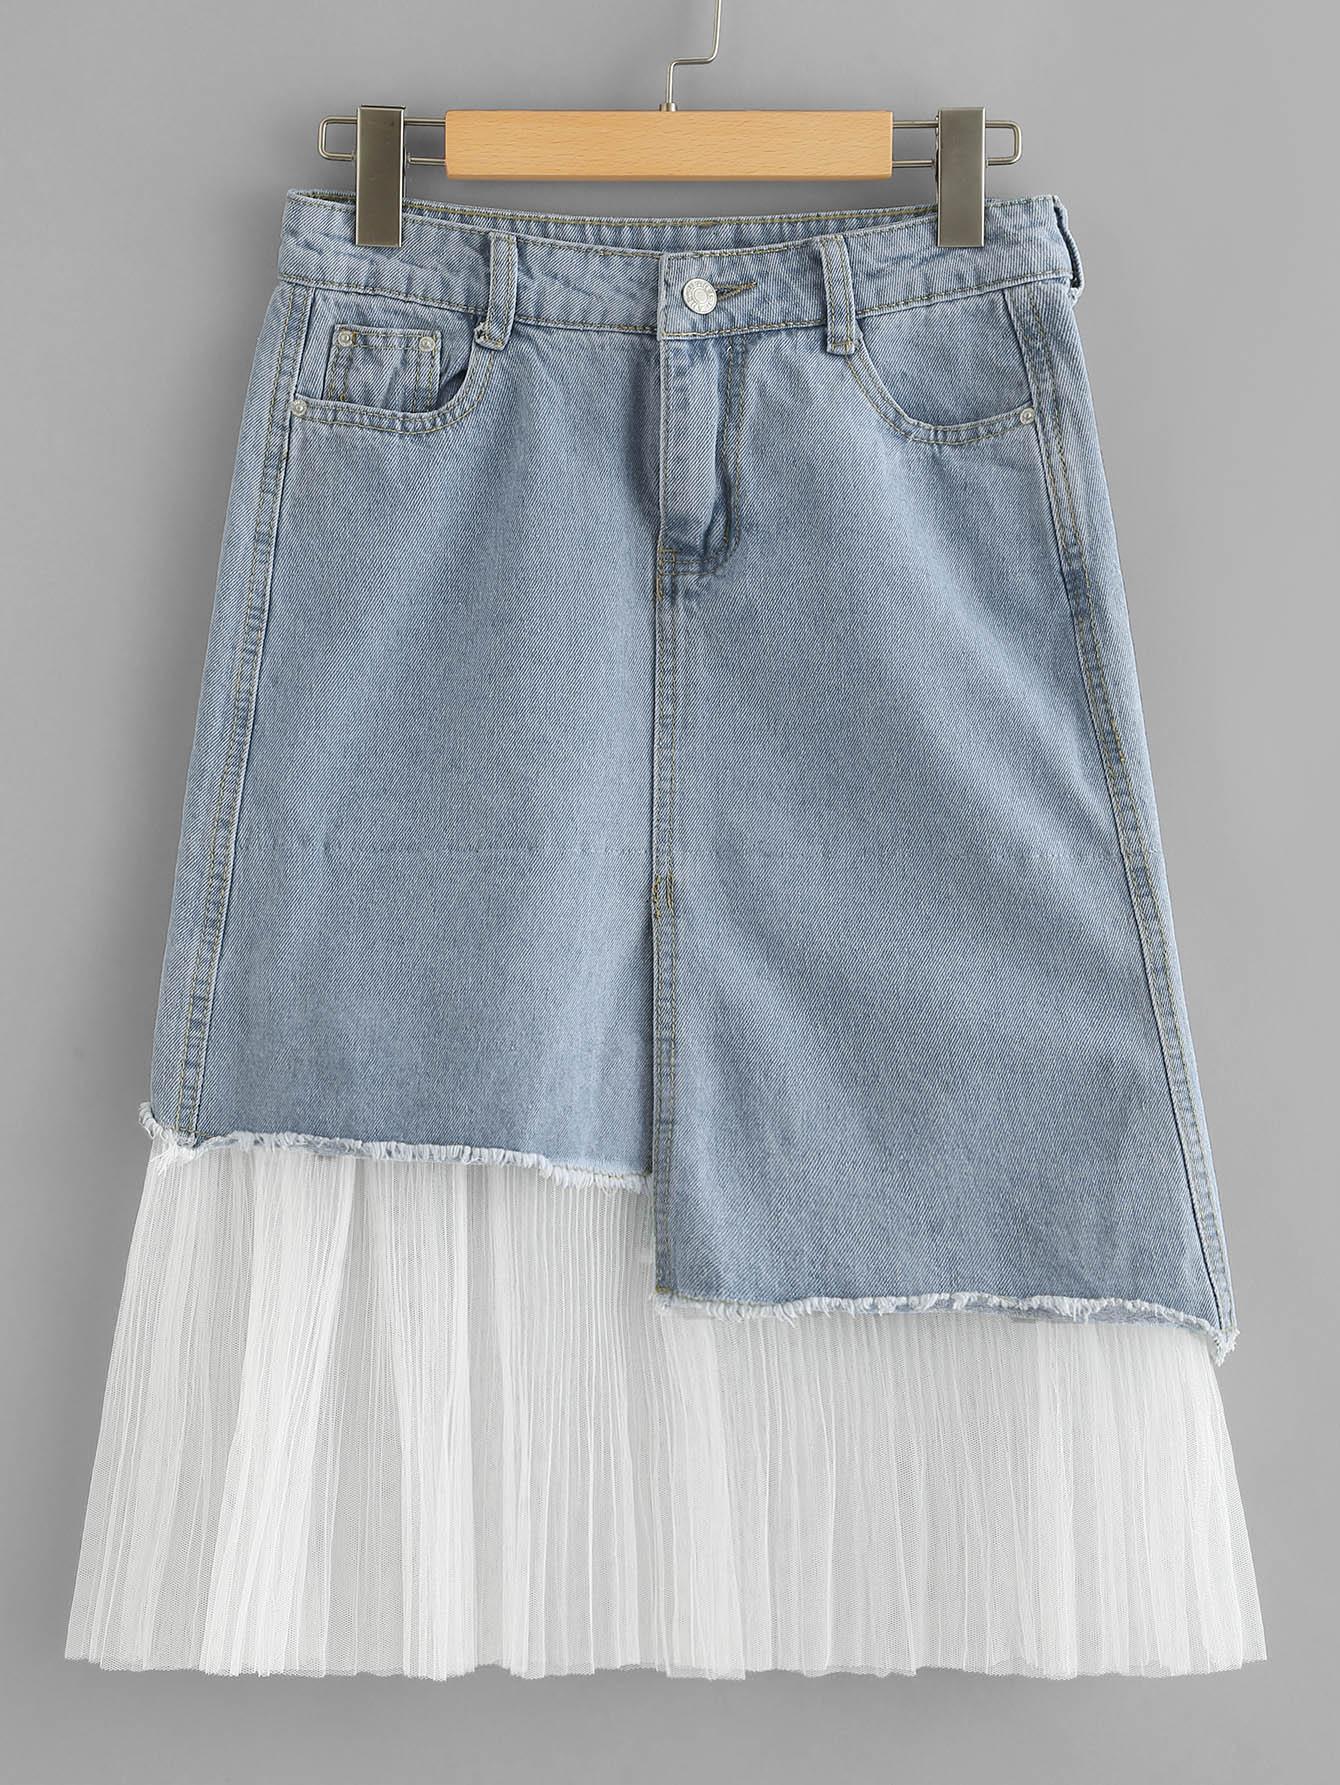 Mesh Contrast Raw Hem Denim Skirt girls single breasted raw hem skirt